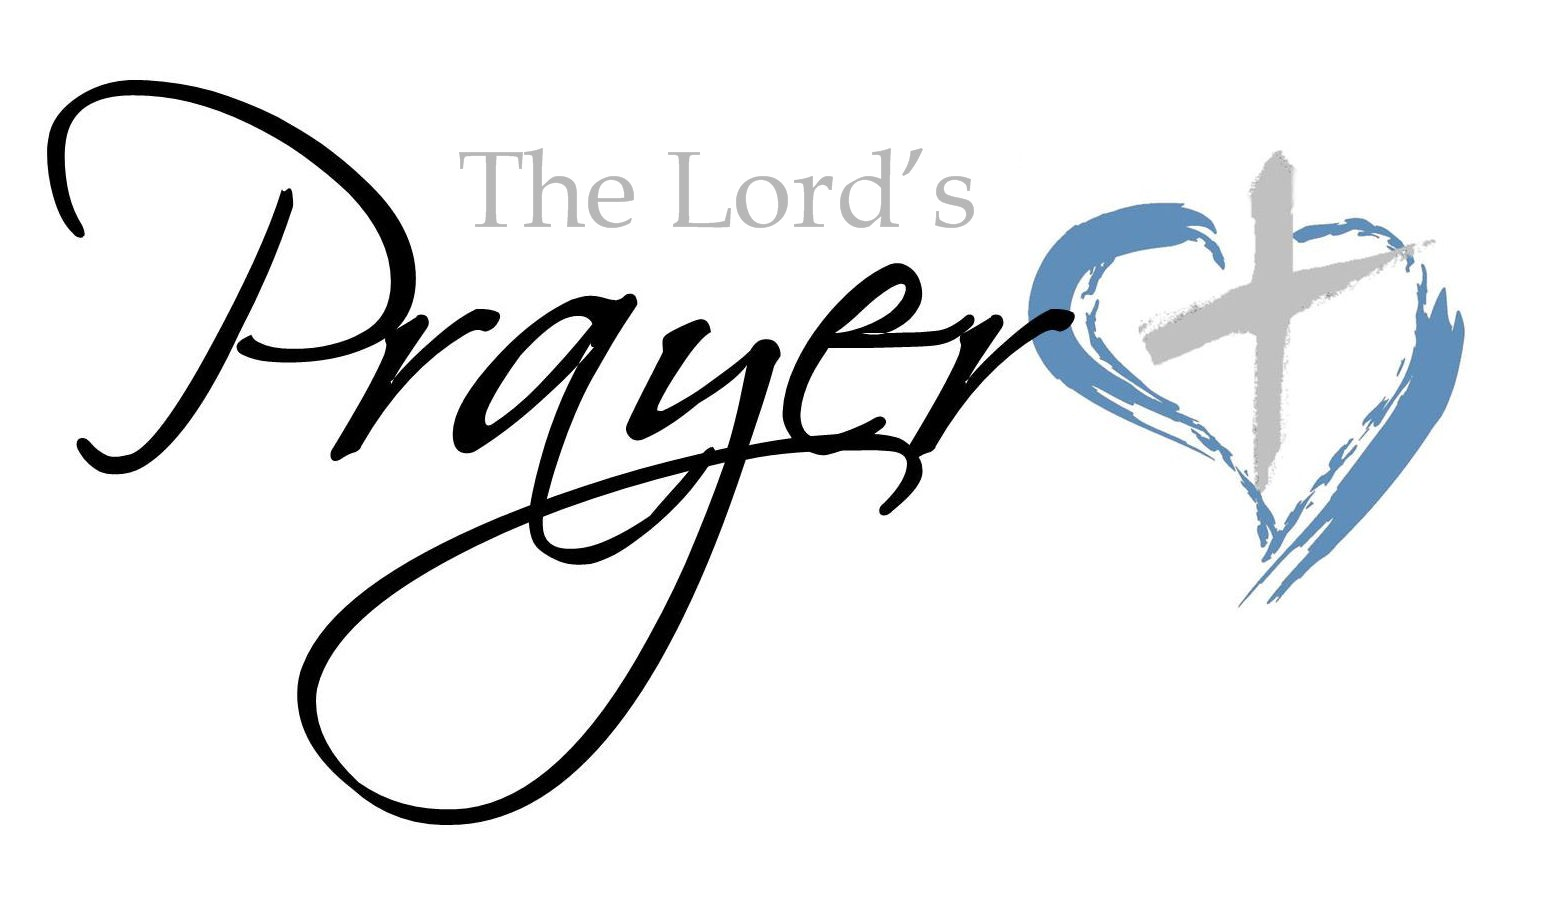 Praying Hands Praying Hand Child Prayer Hands Clip Art Image 6 8